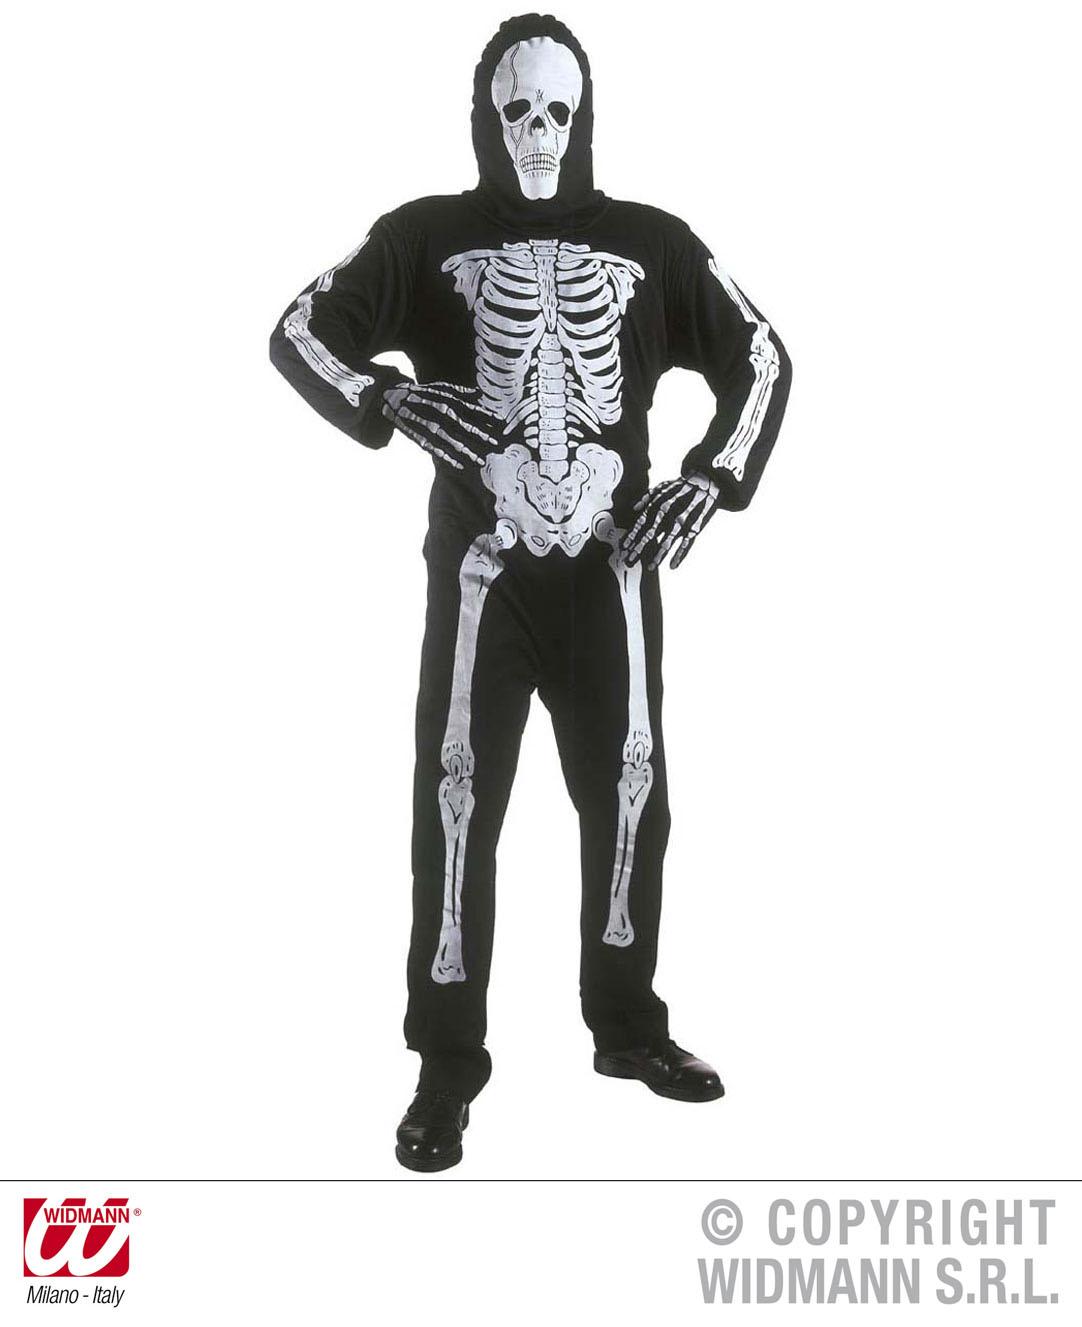 Childrens Scary Skeleton Fancy Dress Costume Halloween Skull Outfit 140Cm